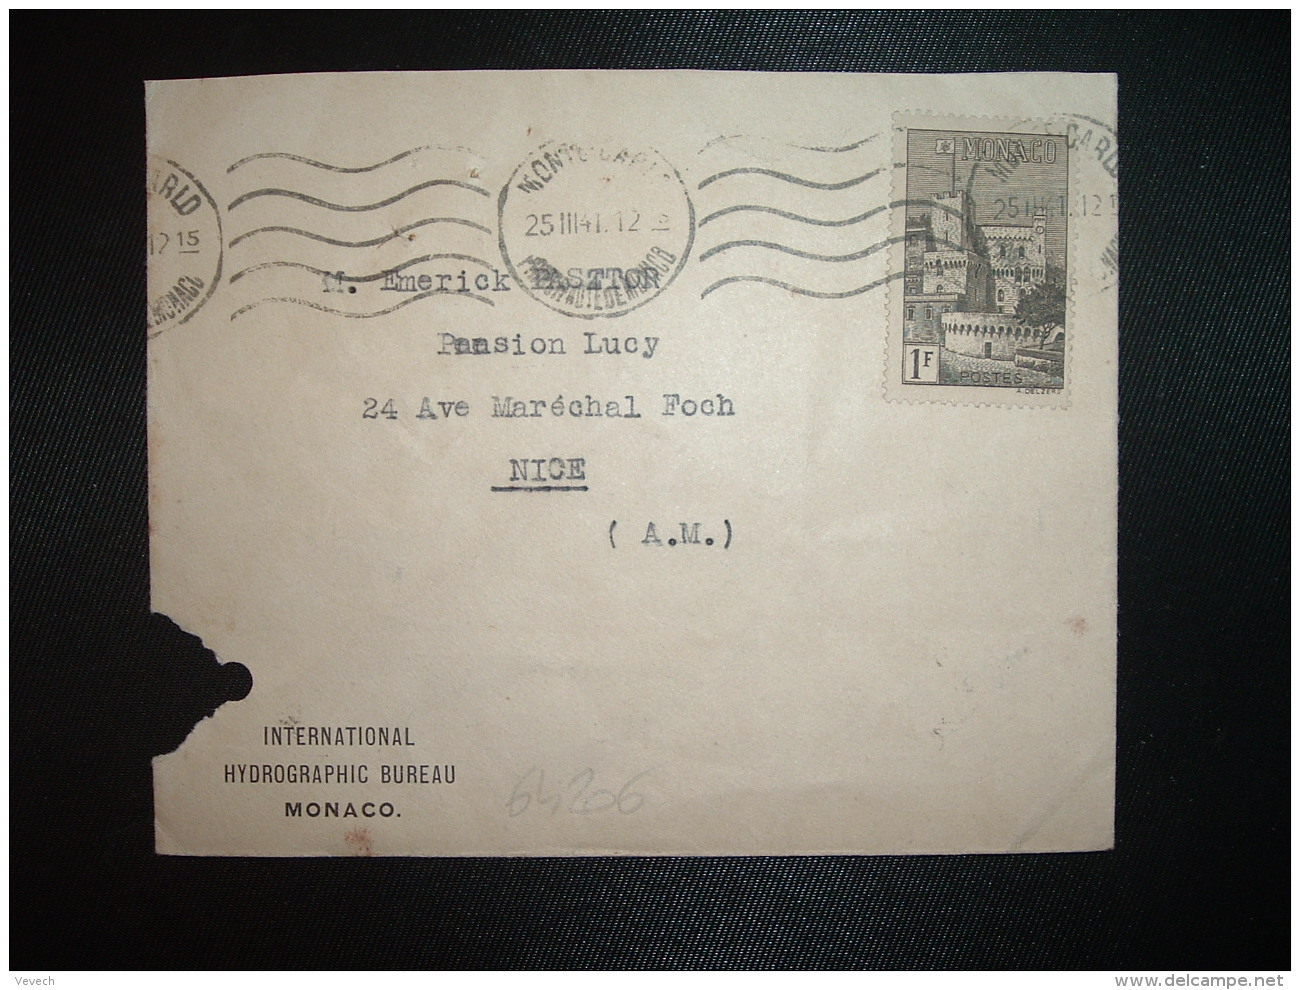 LETTRE TP 1F OBL.MEC.25 III 41 MONTE-CARLO PRINCIPAUTE DE MONACO + INTERNATIONAL HYDROGRAPHIC BUREAU - Monaco